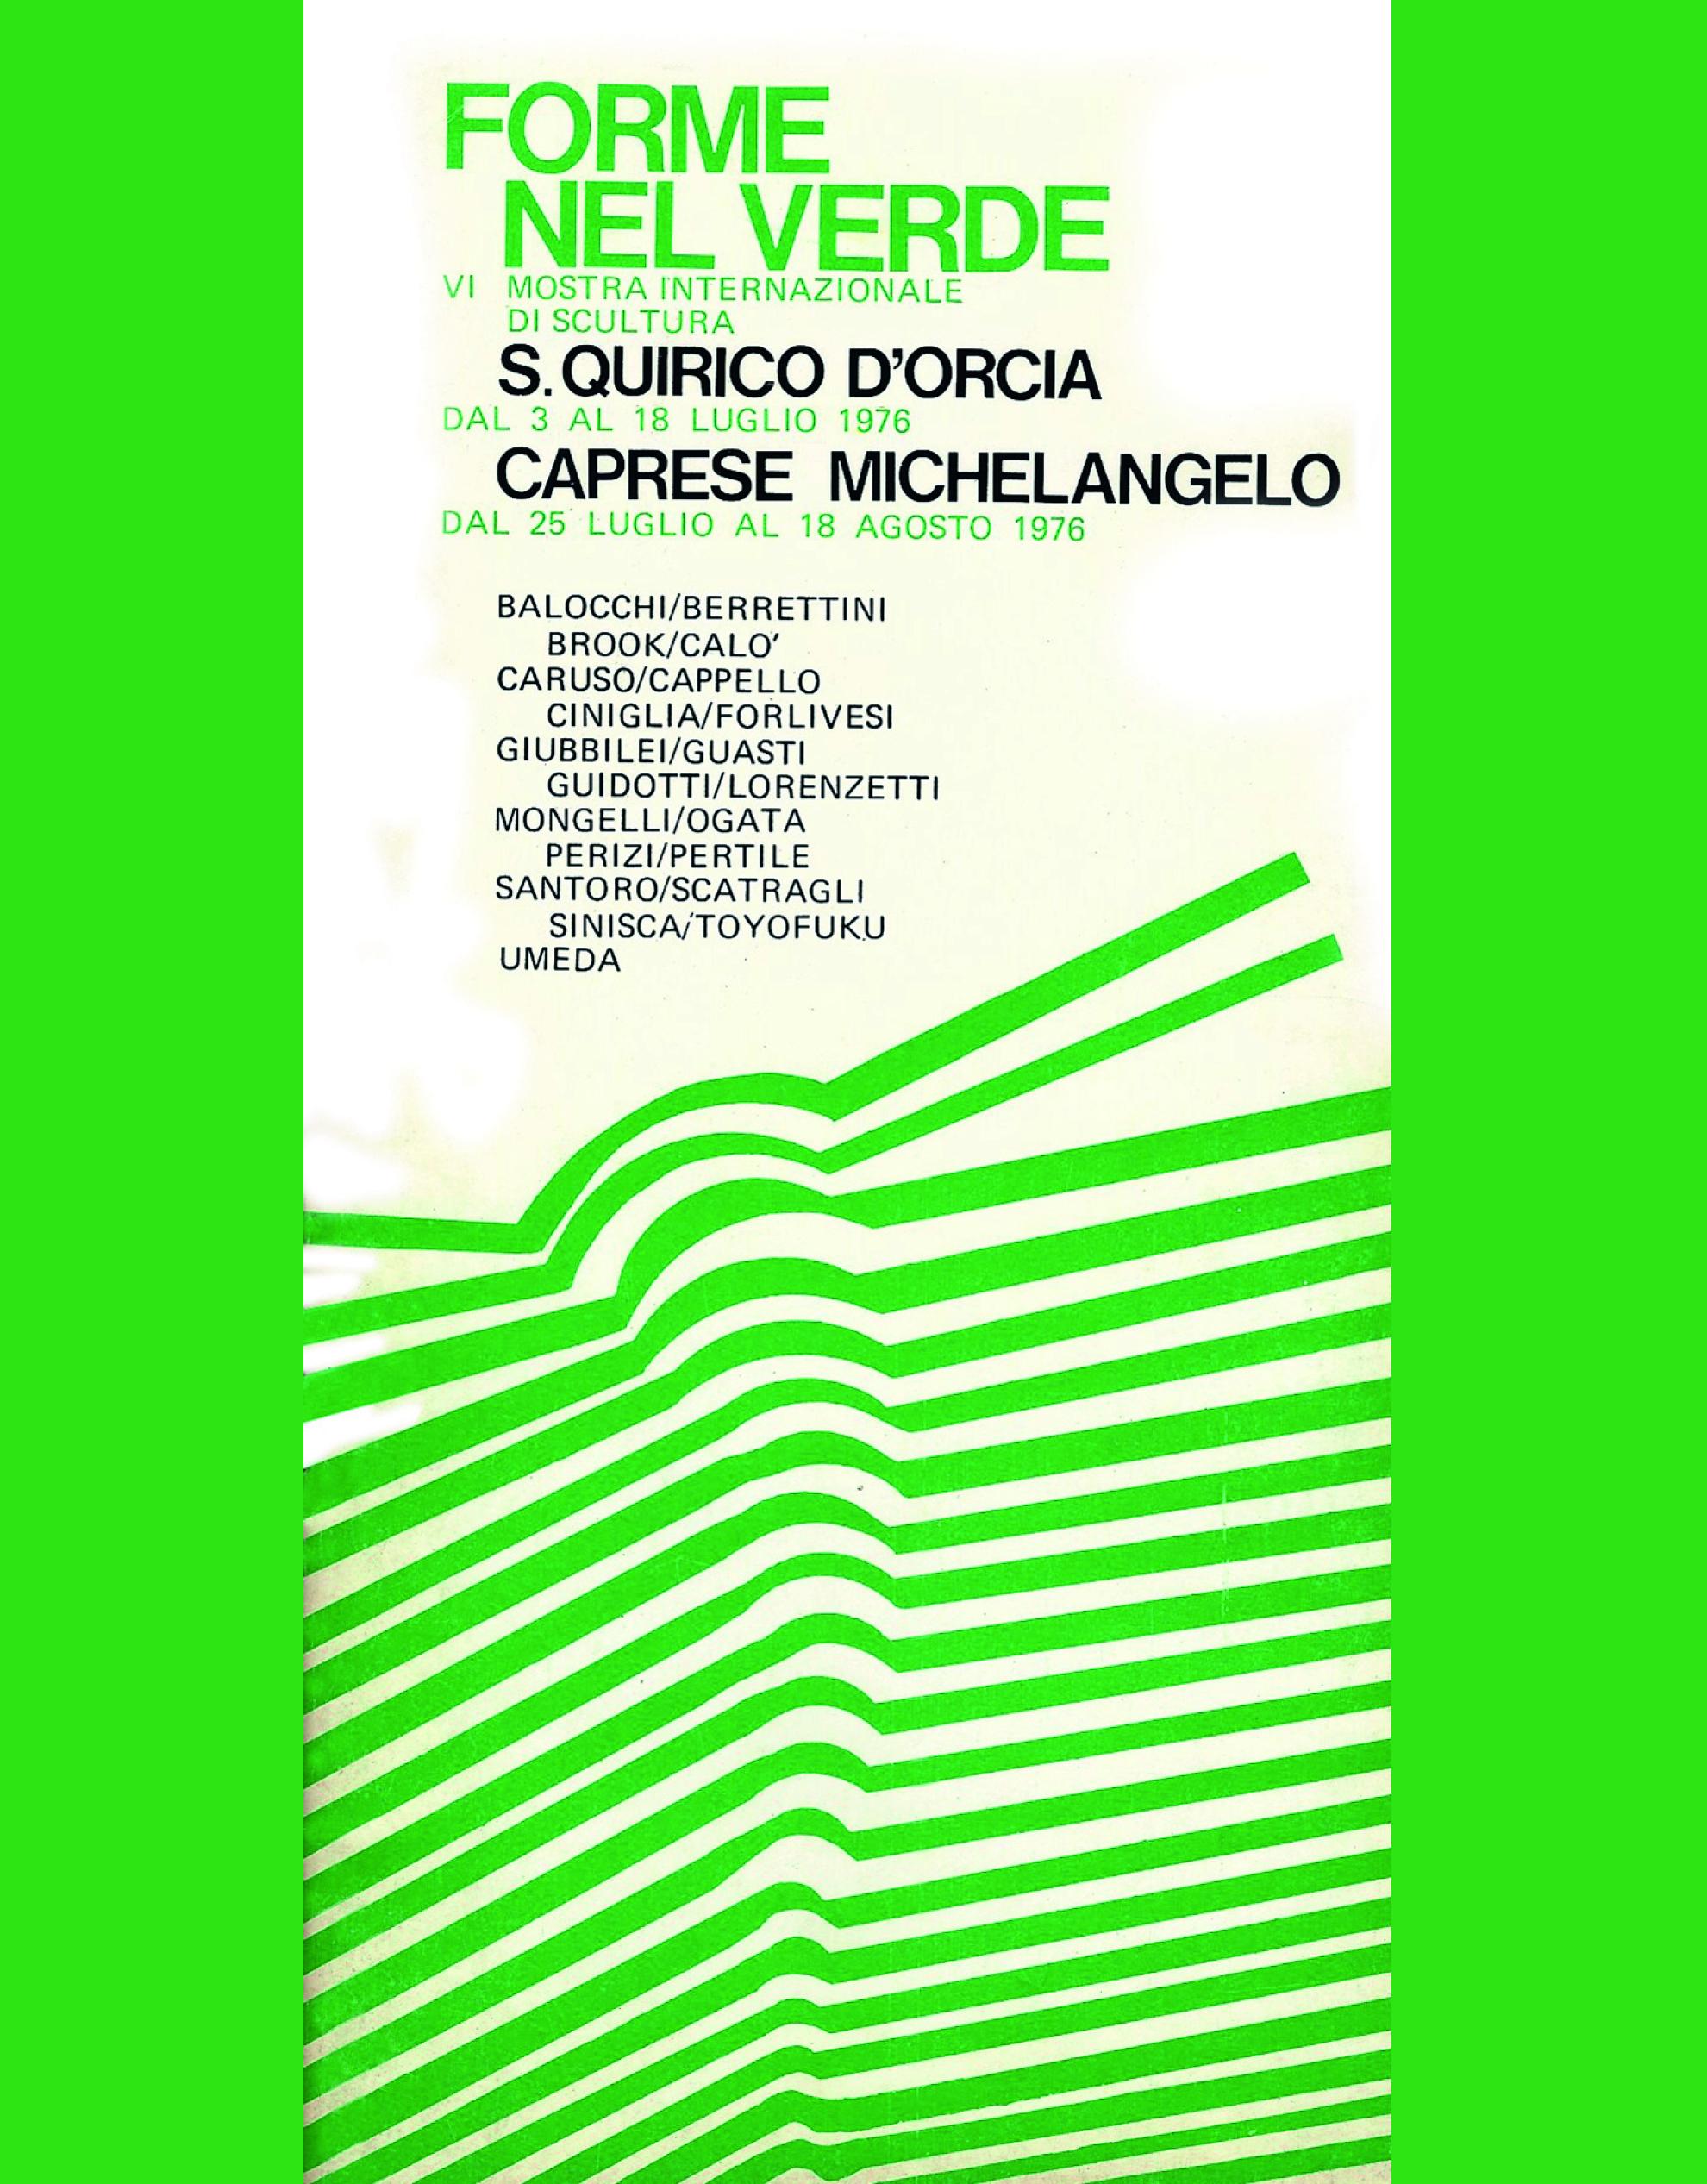 Catalogo Forme nel Verde 1976